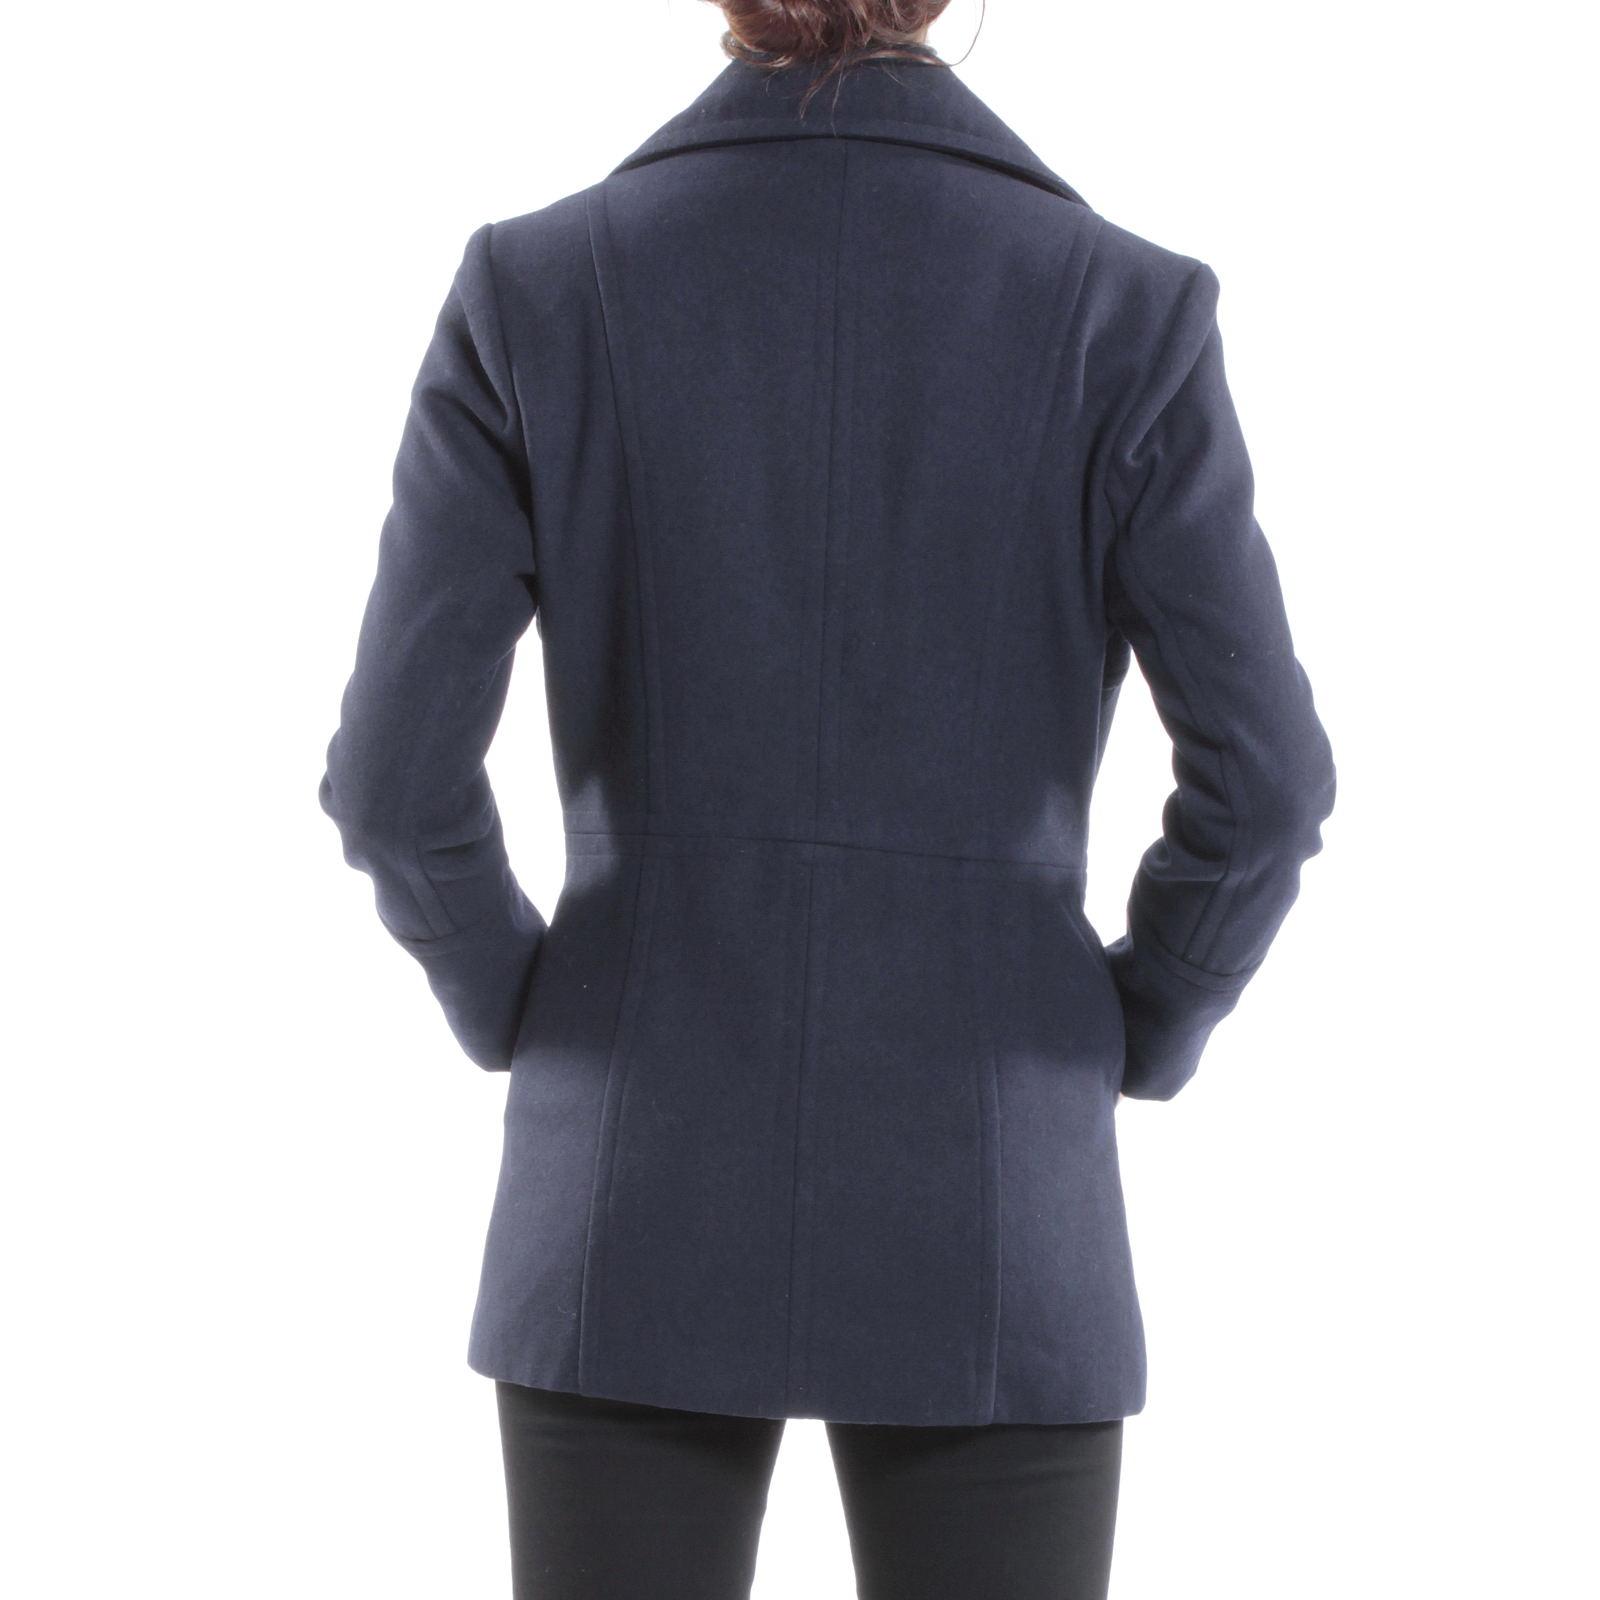 Alpine-Swiss-Emma-Womens-Peacoat-Jacket-Wool-Blazer-Double-Breasted-Overcoat-New thumbnail 47